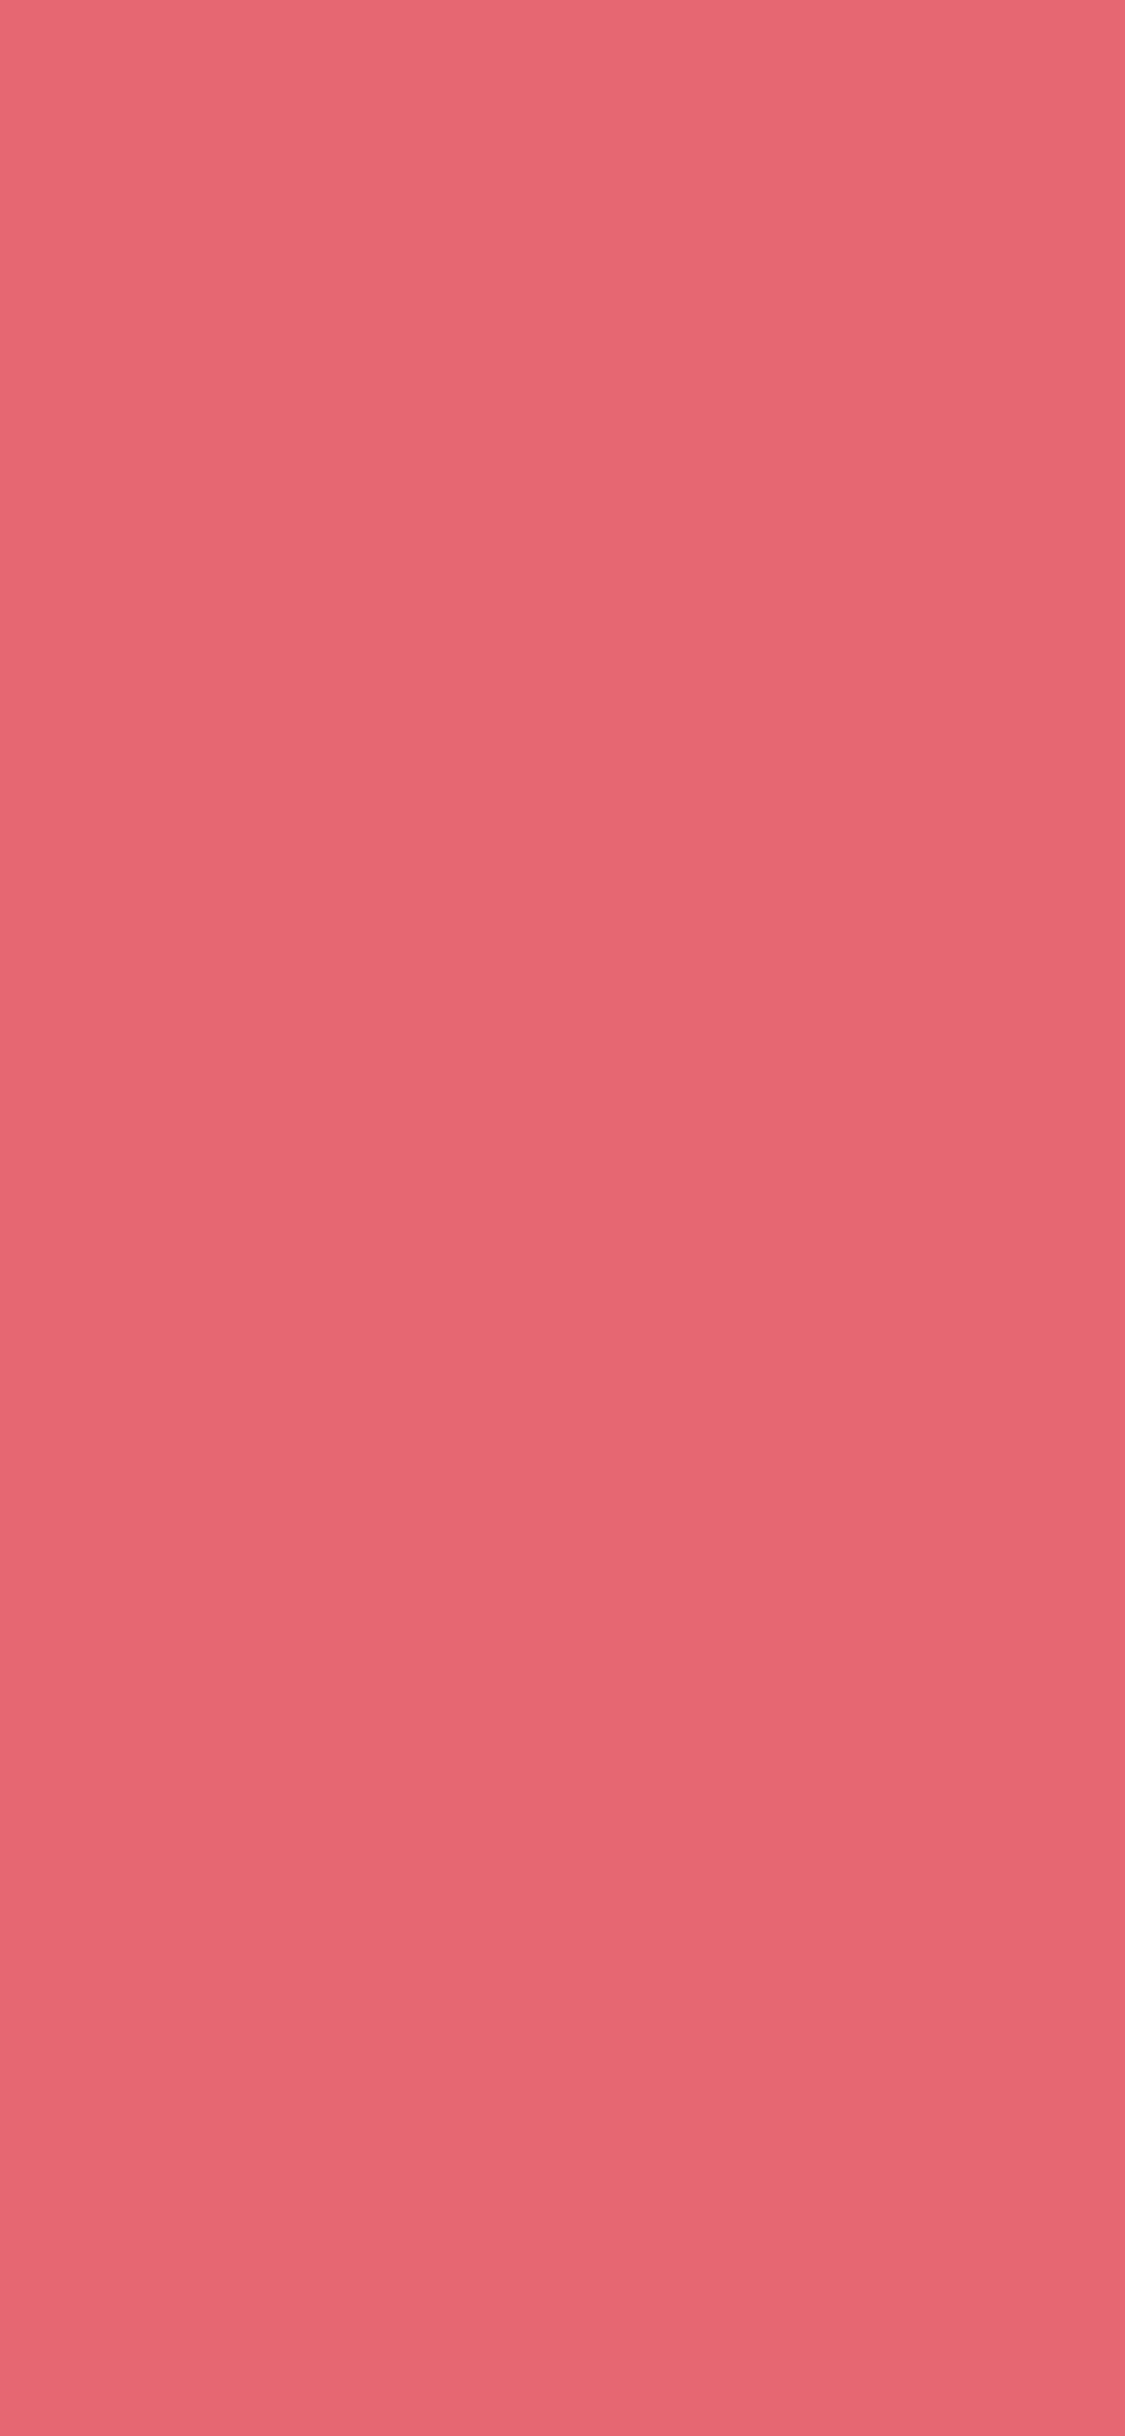 1125x2436 Light Carmine Pink Solid Color Background